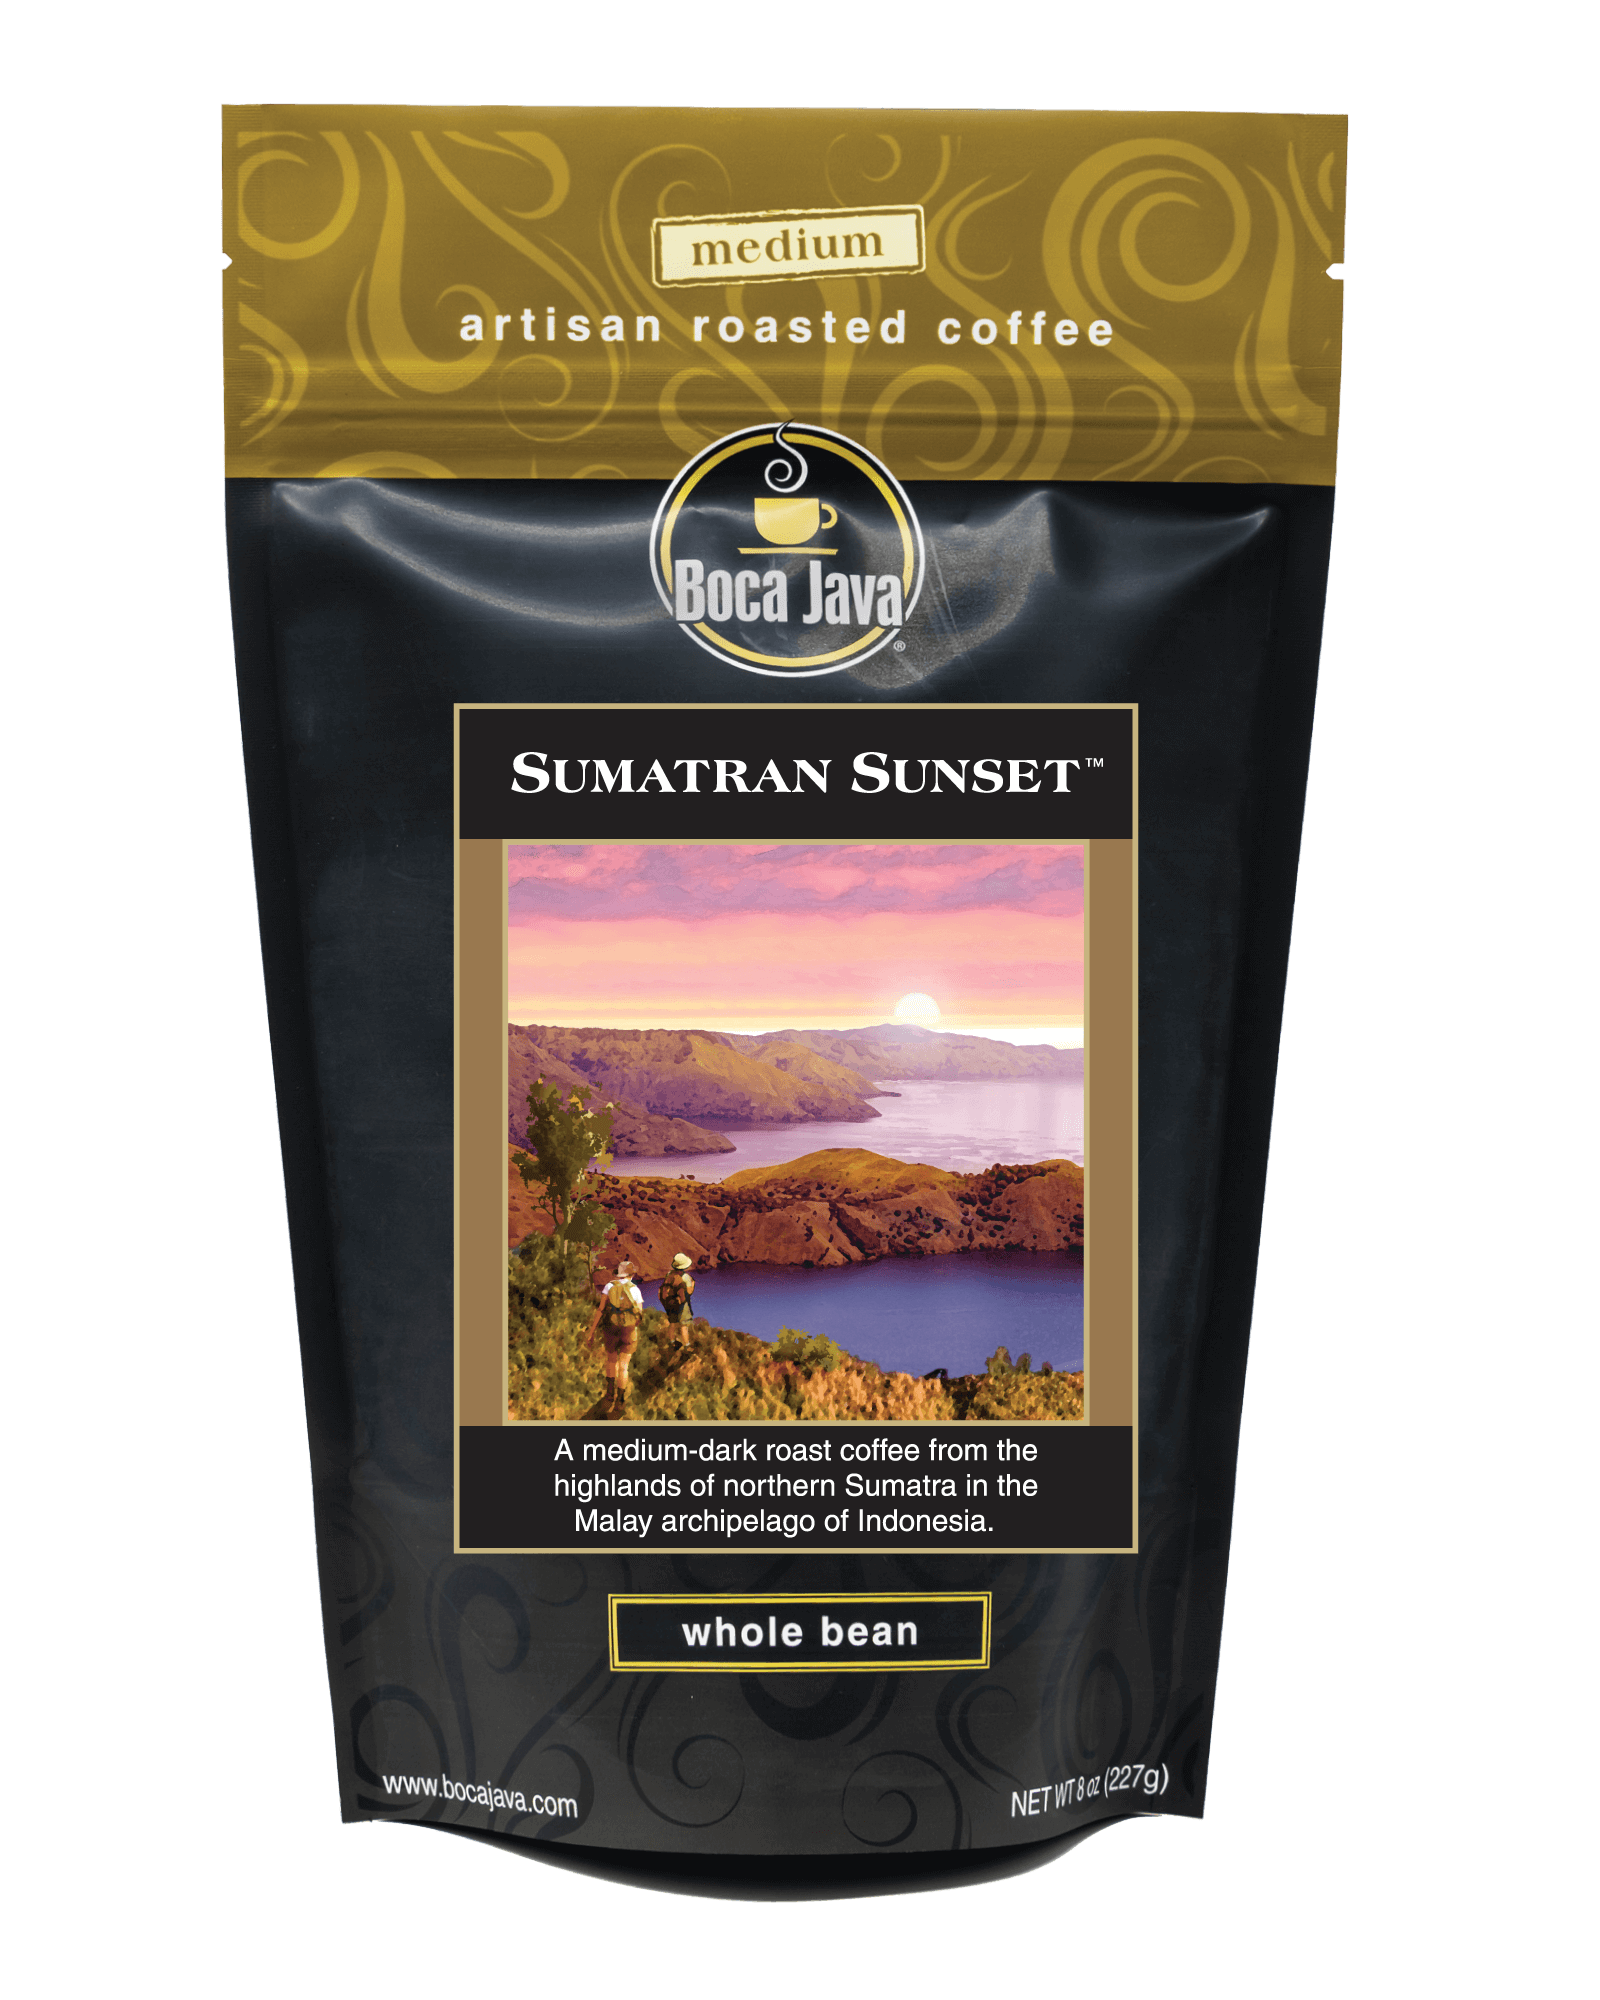 Sumatran Sunset